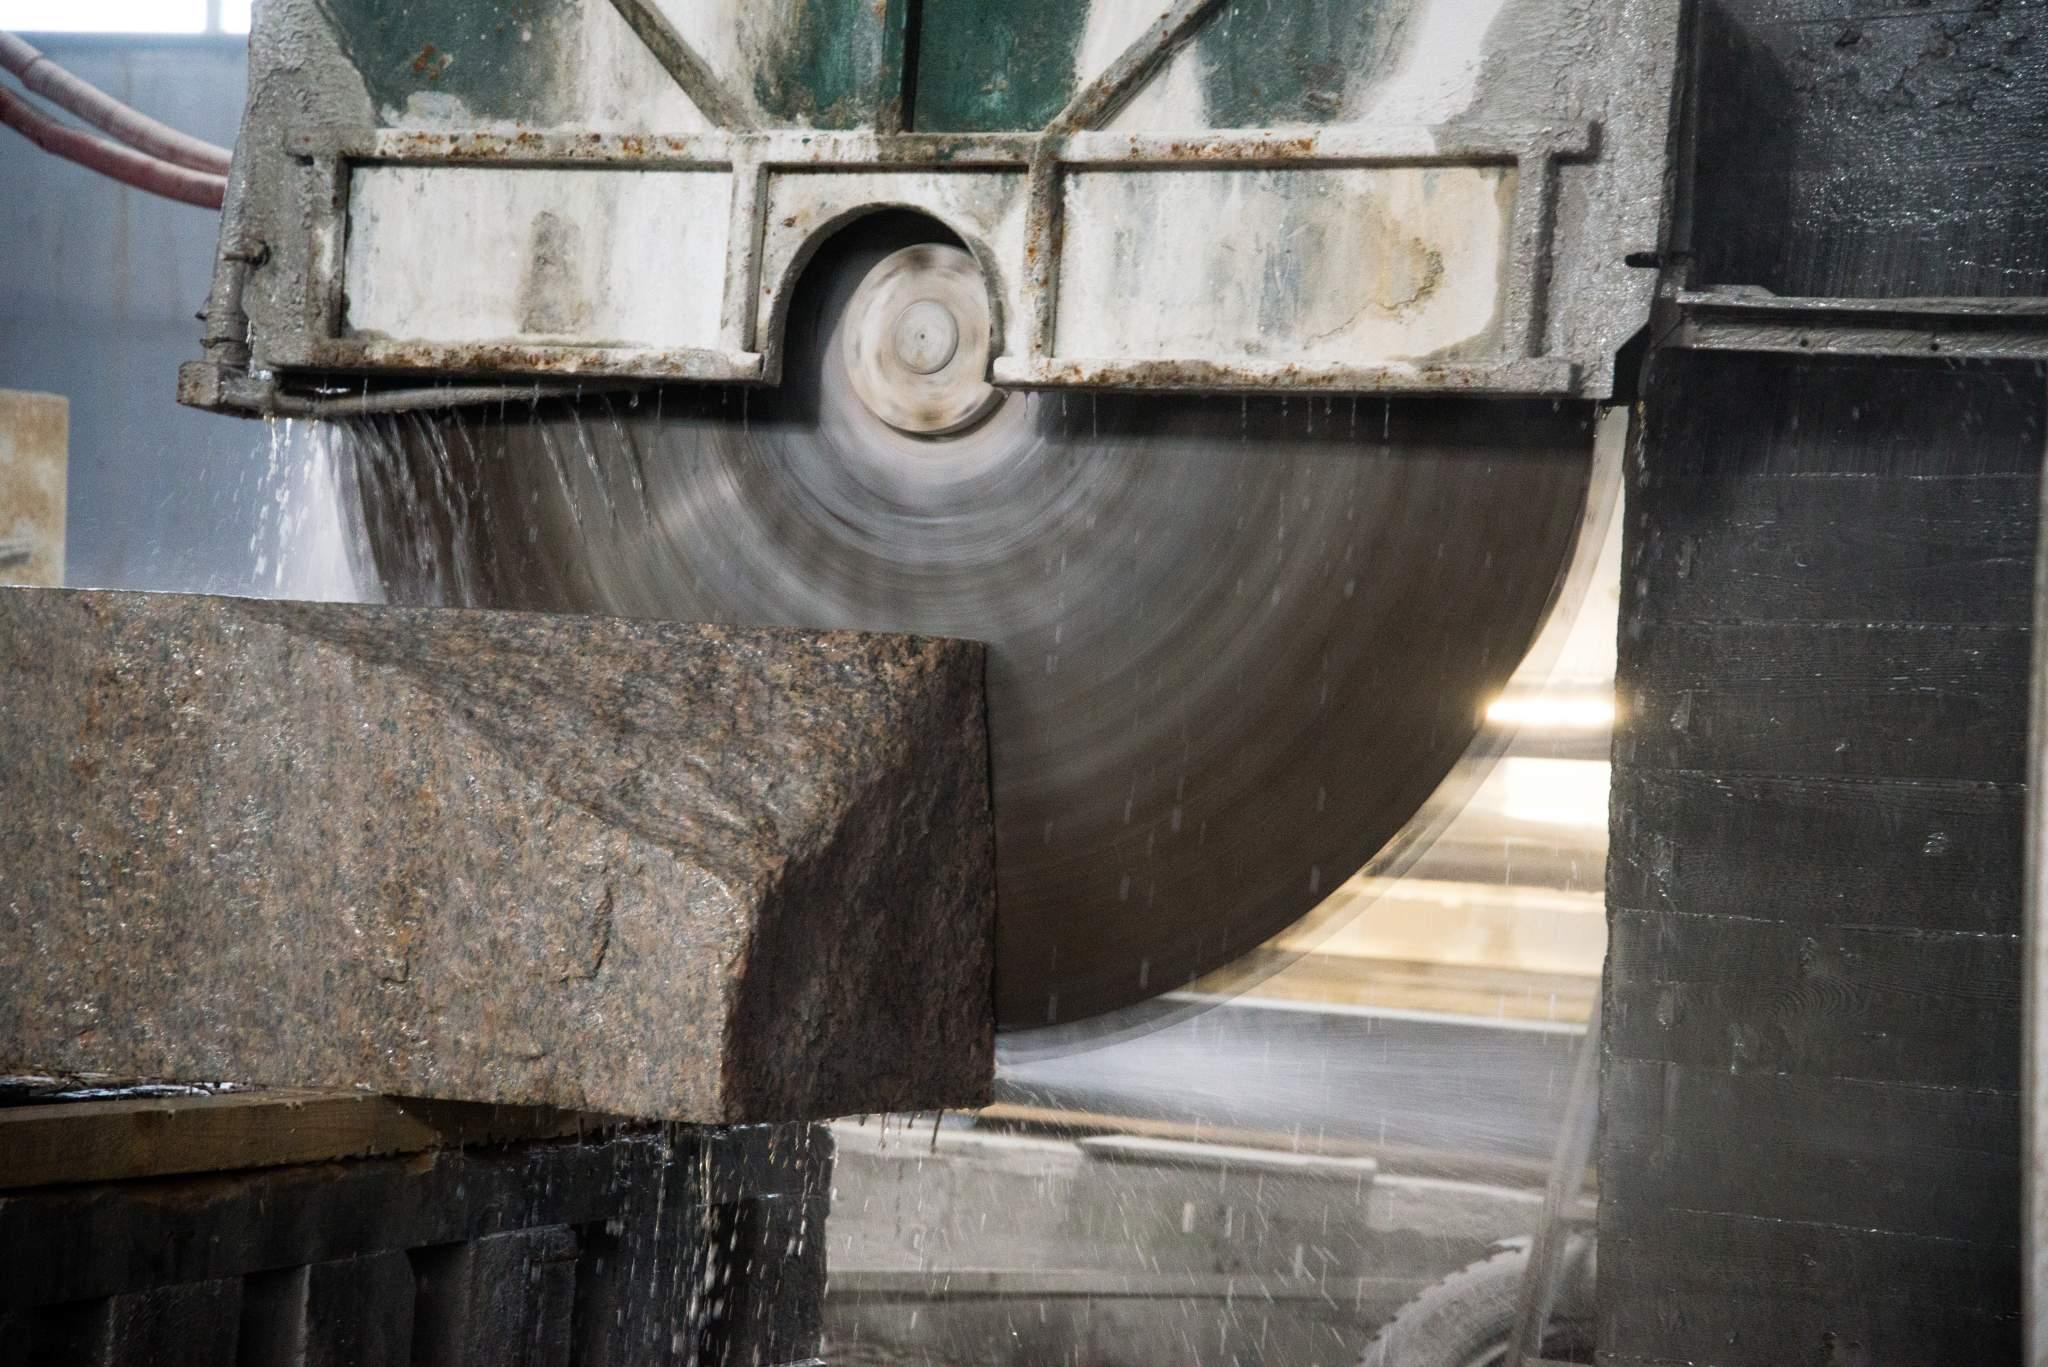 granite countertops durability